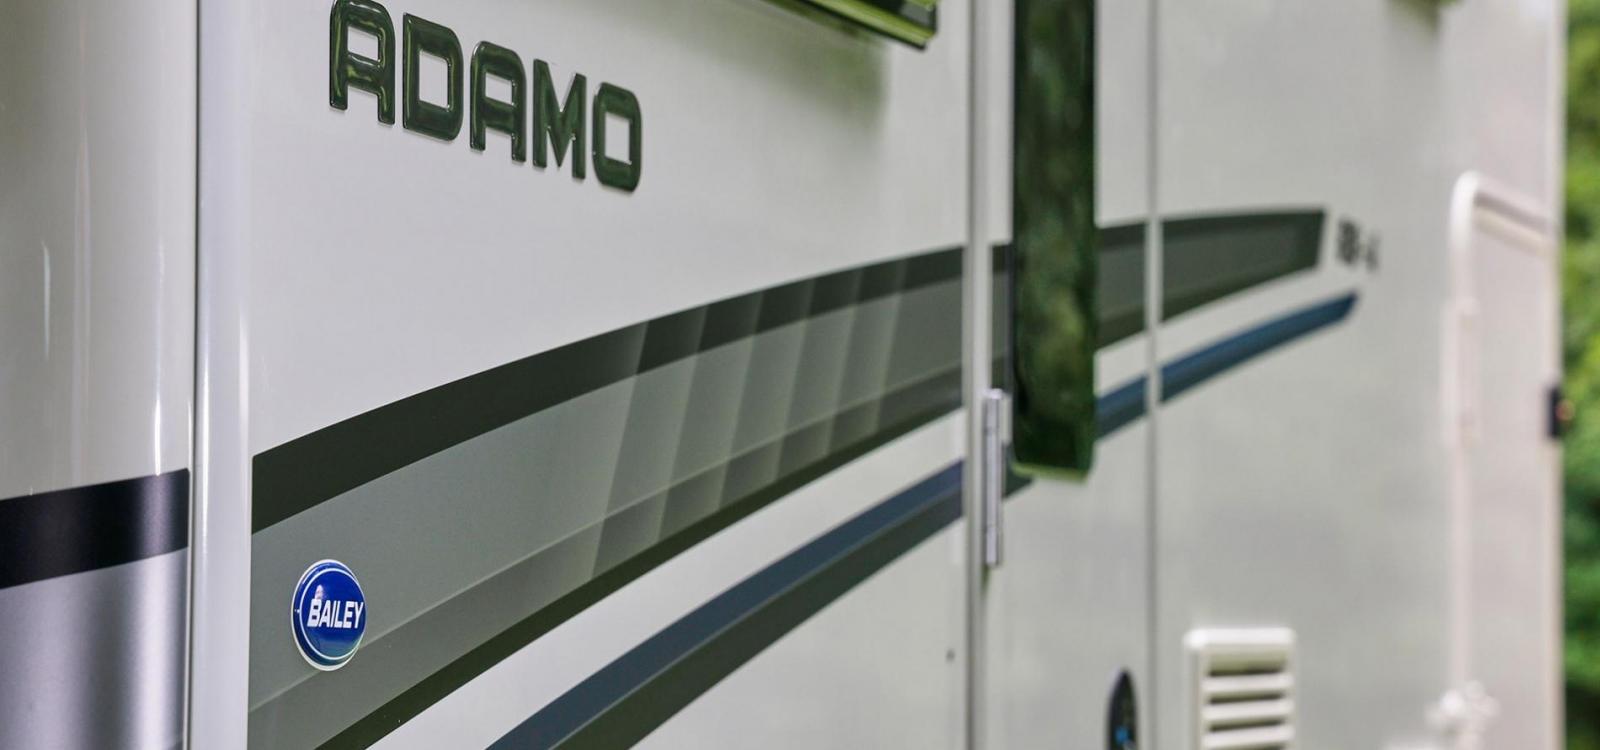 Fortuna - Adamo 75-4i